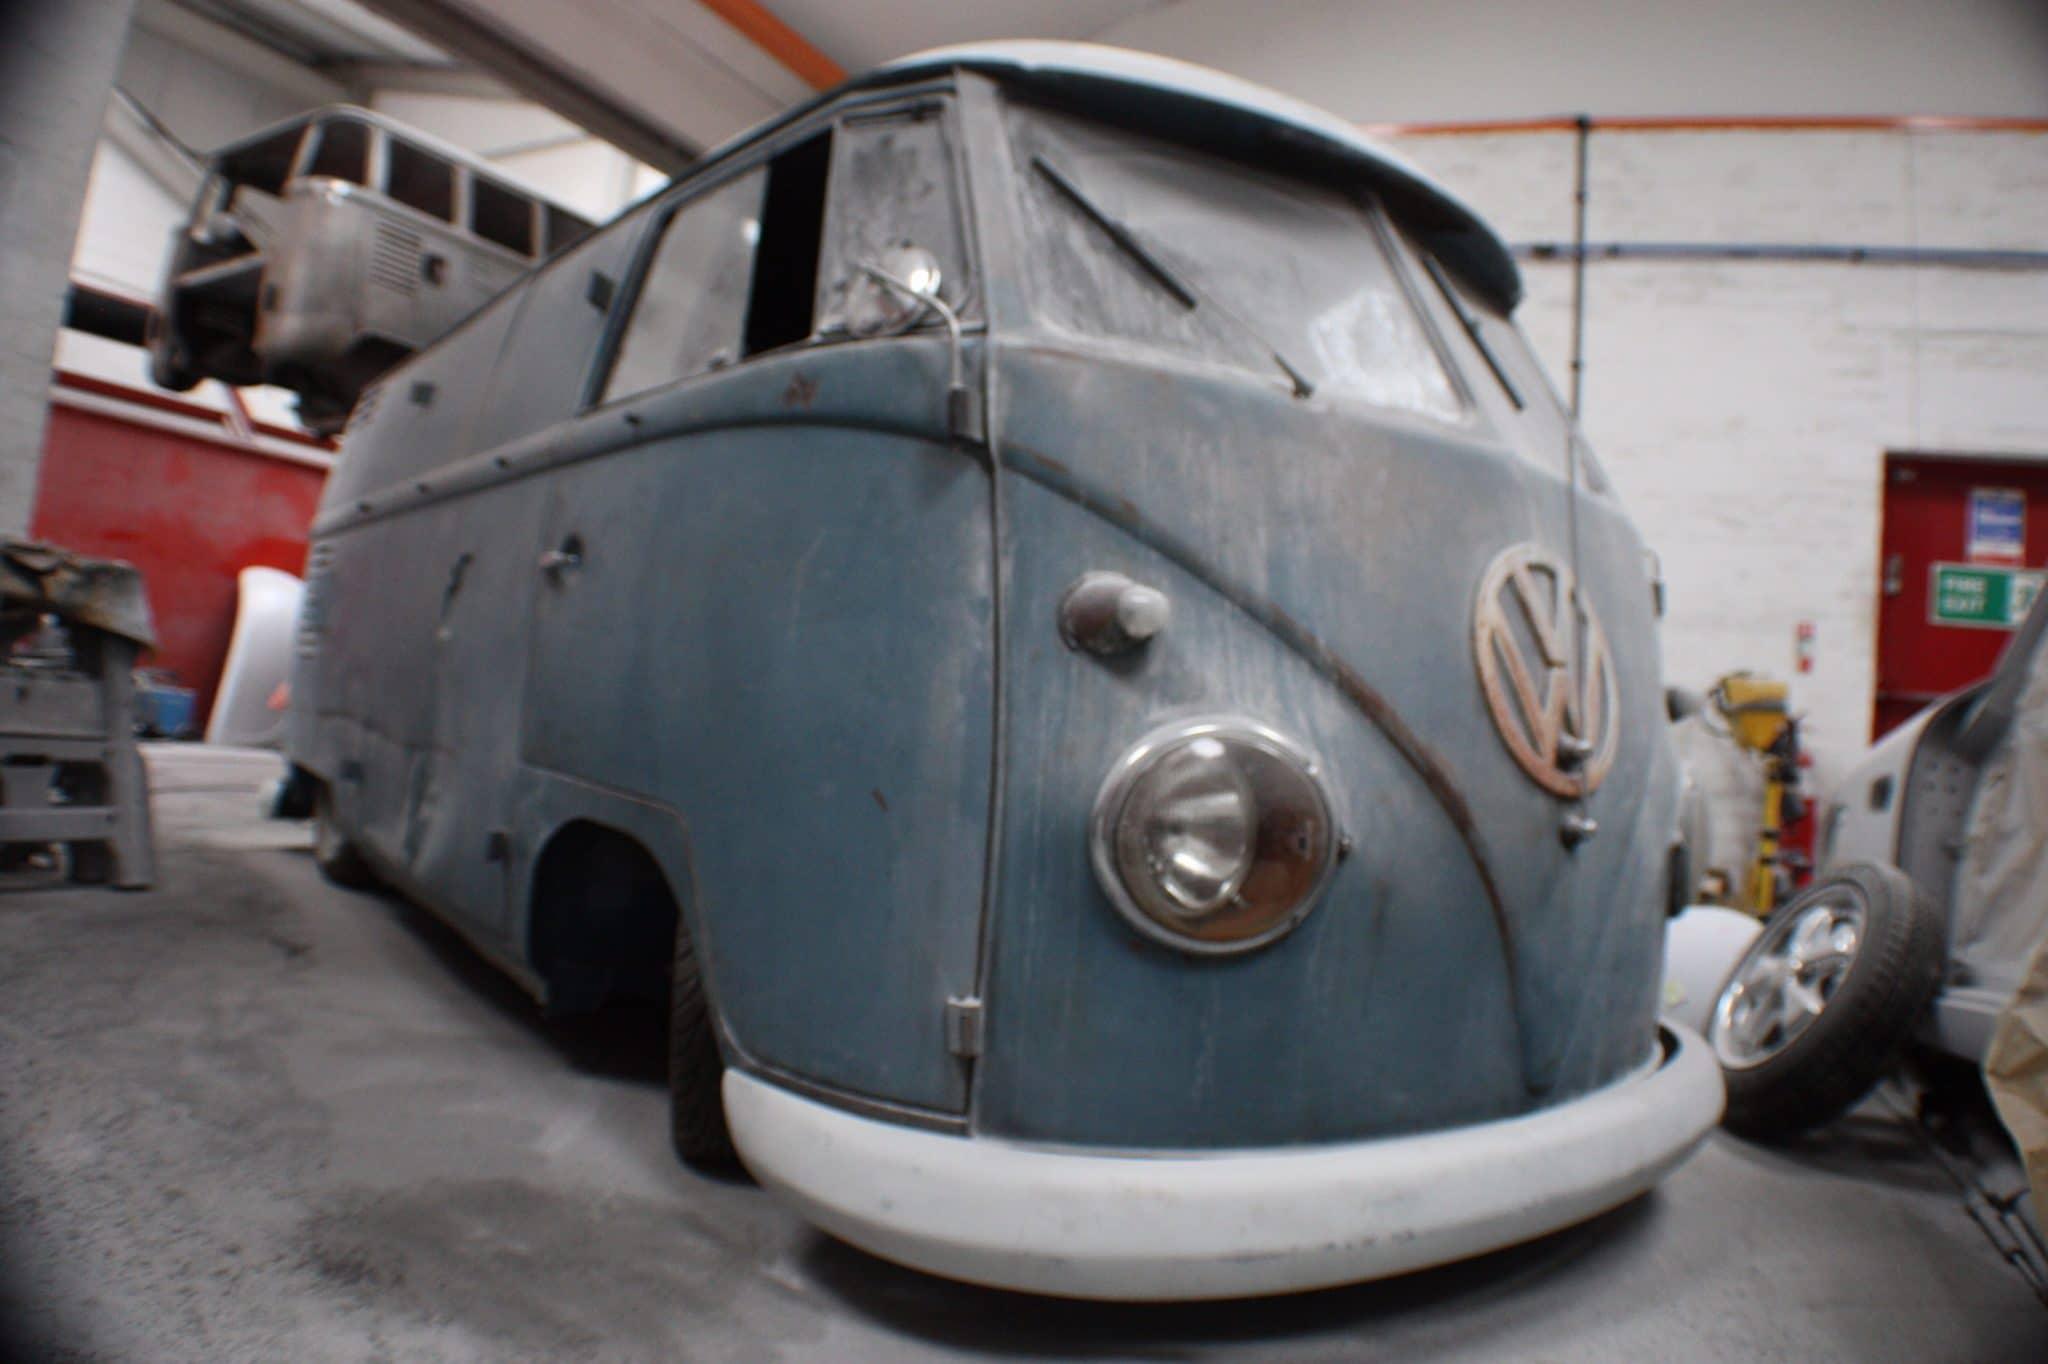 VW camper van in process of restoration